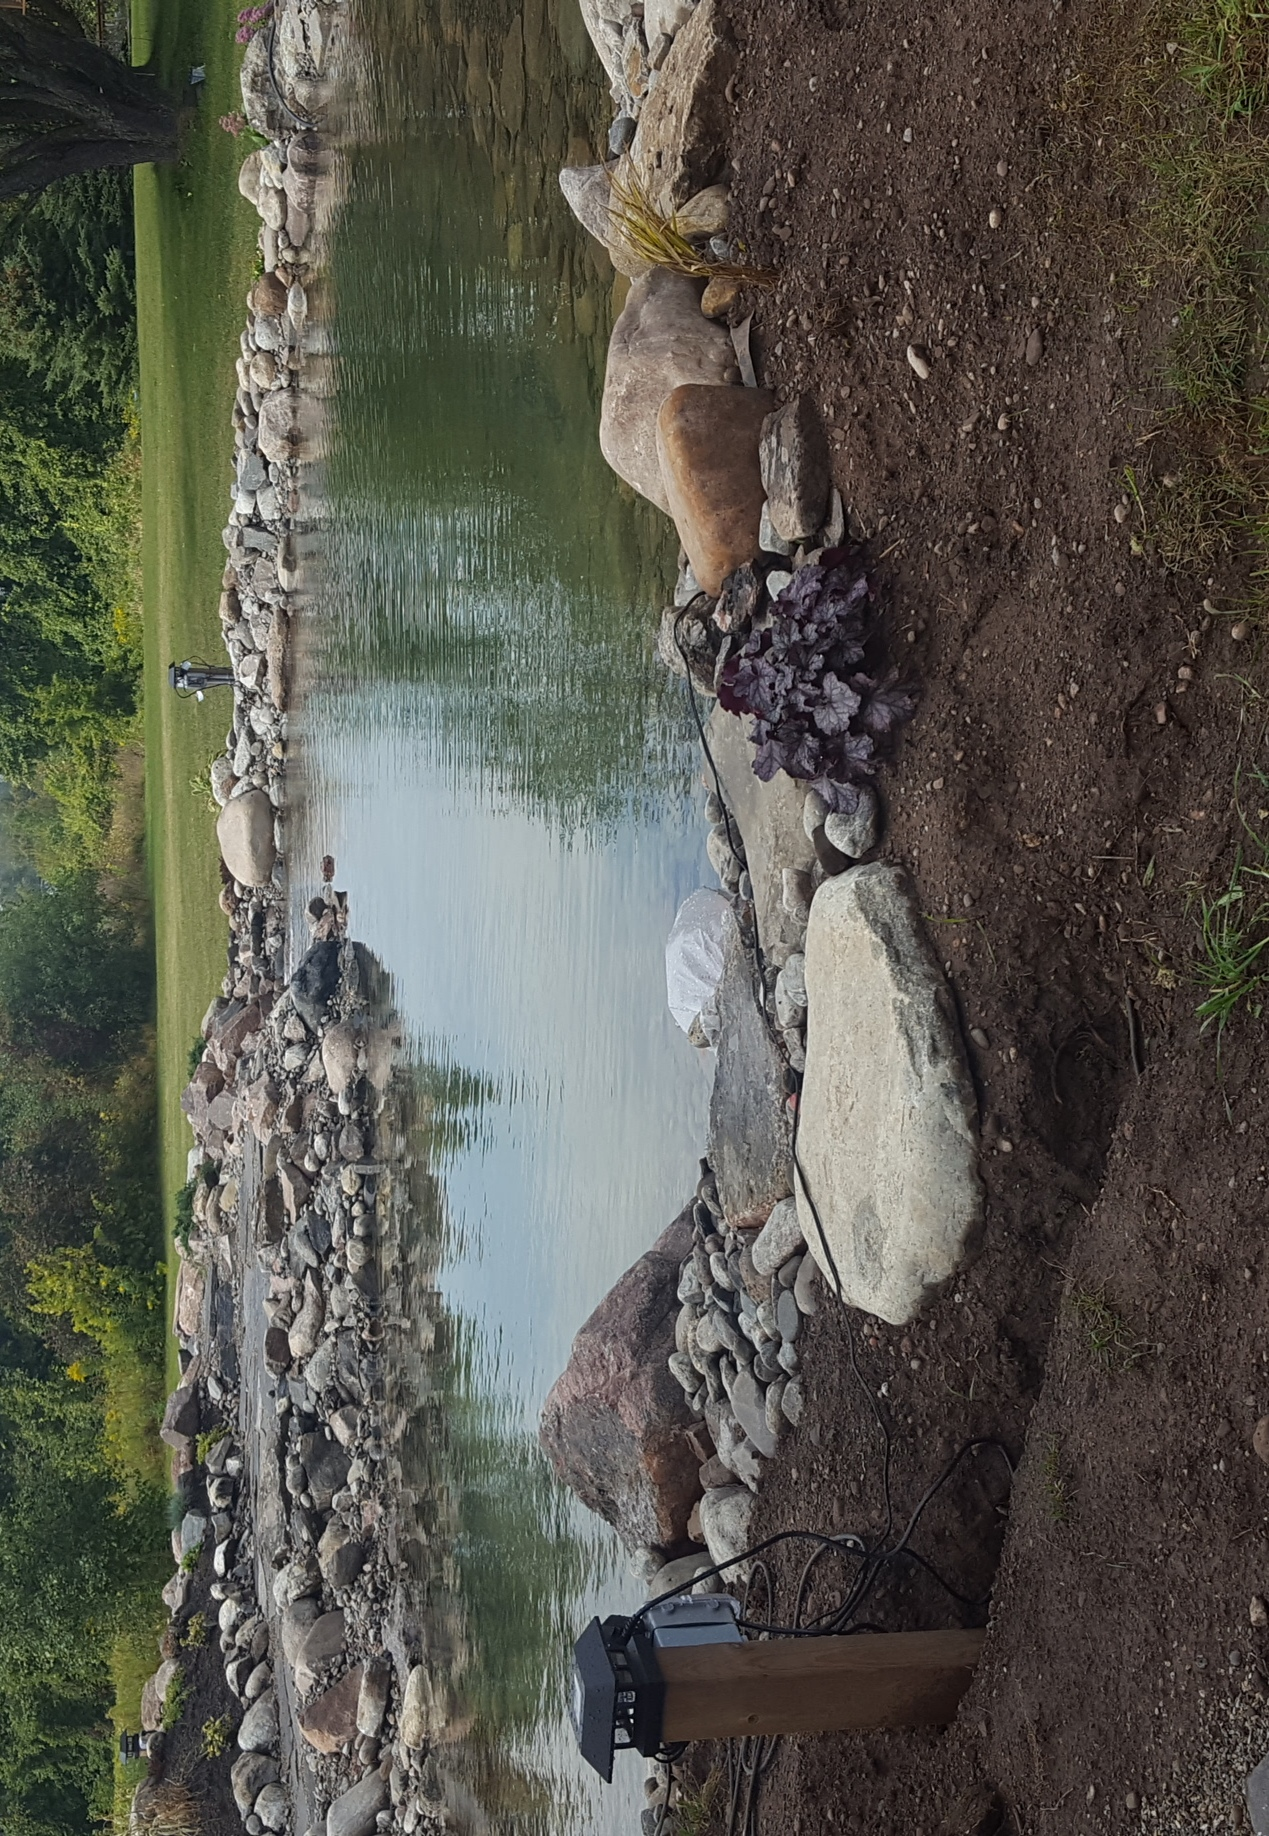 Swim Pond - 5500 gallons